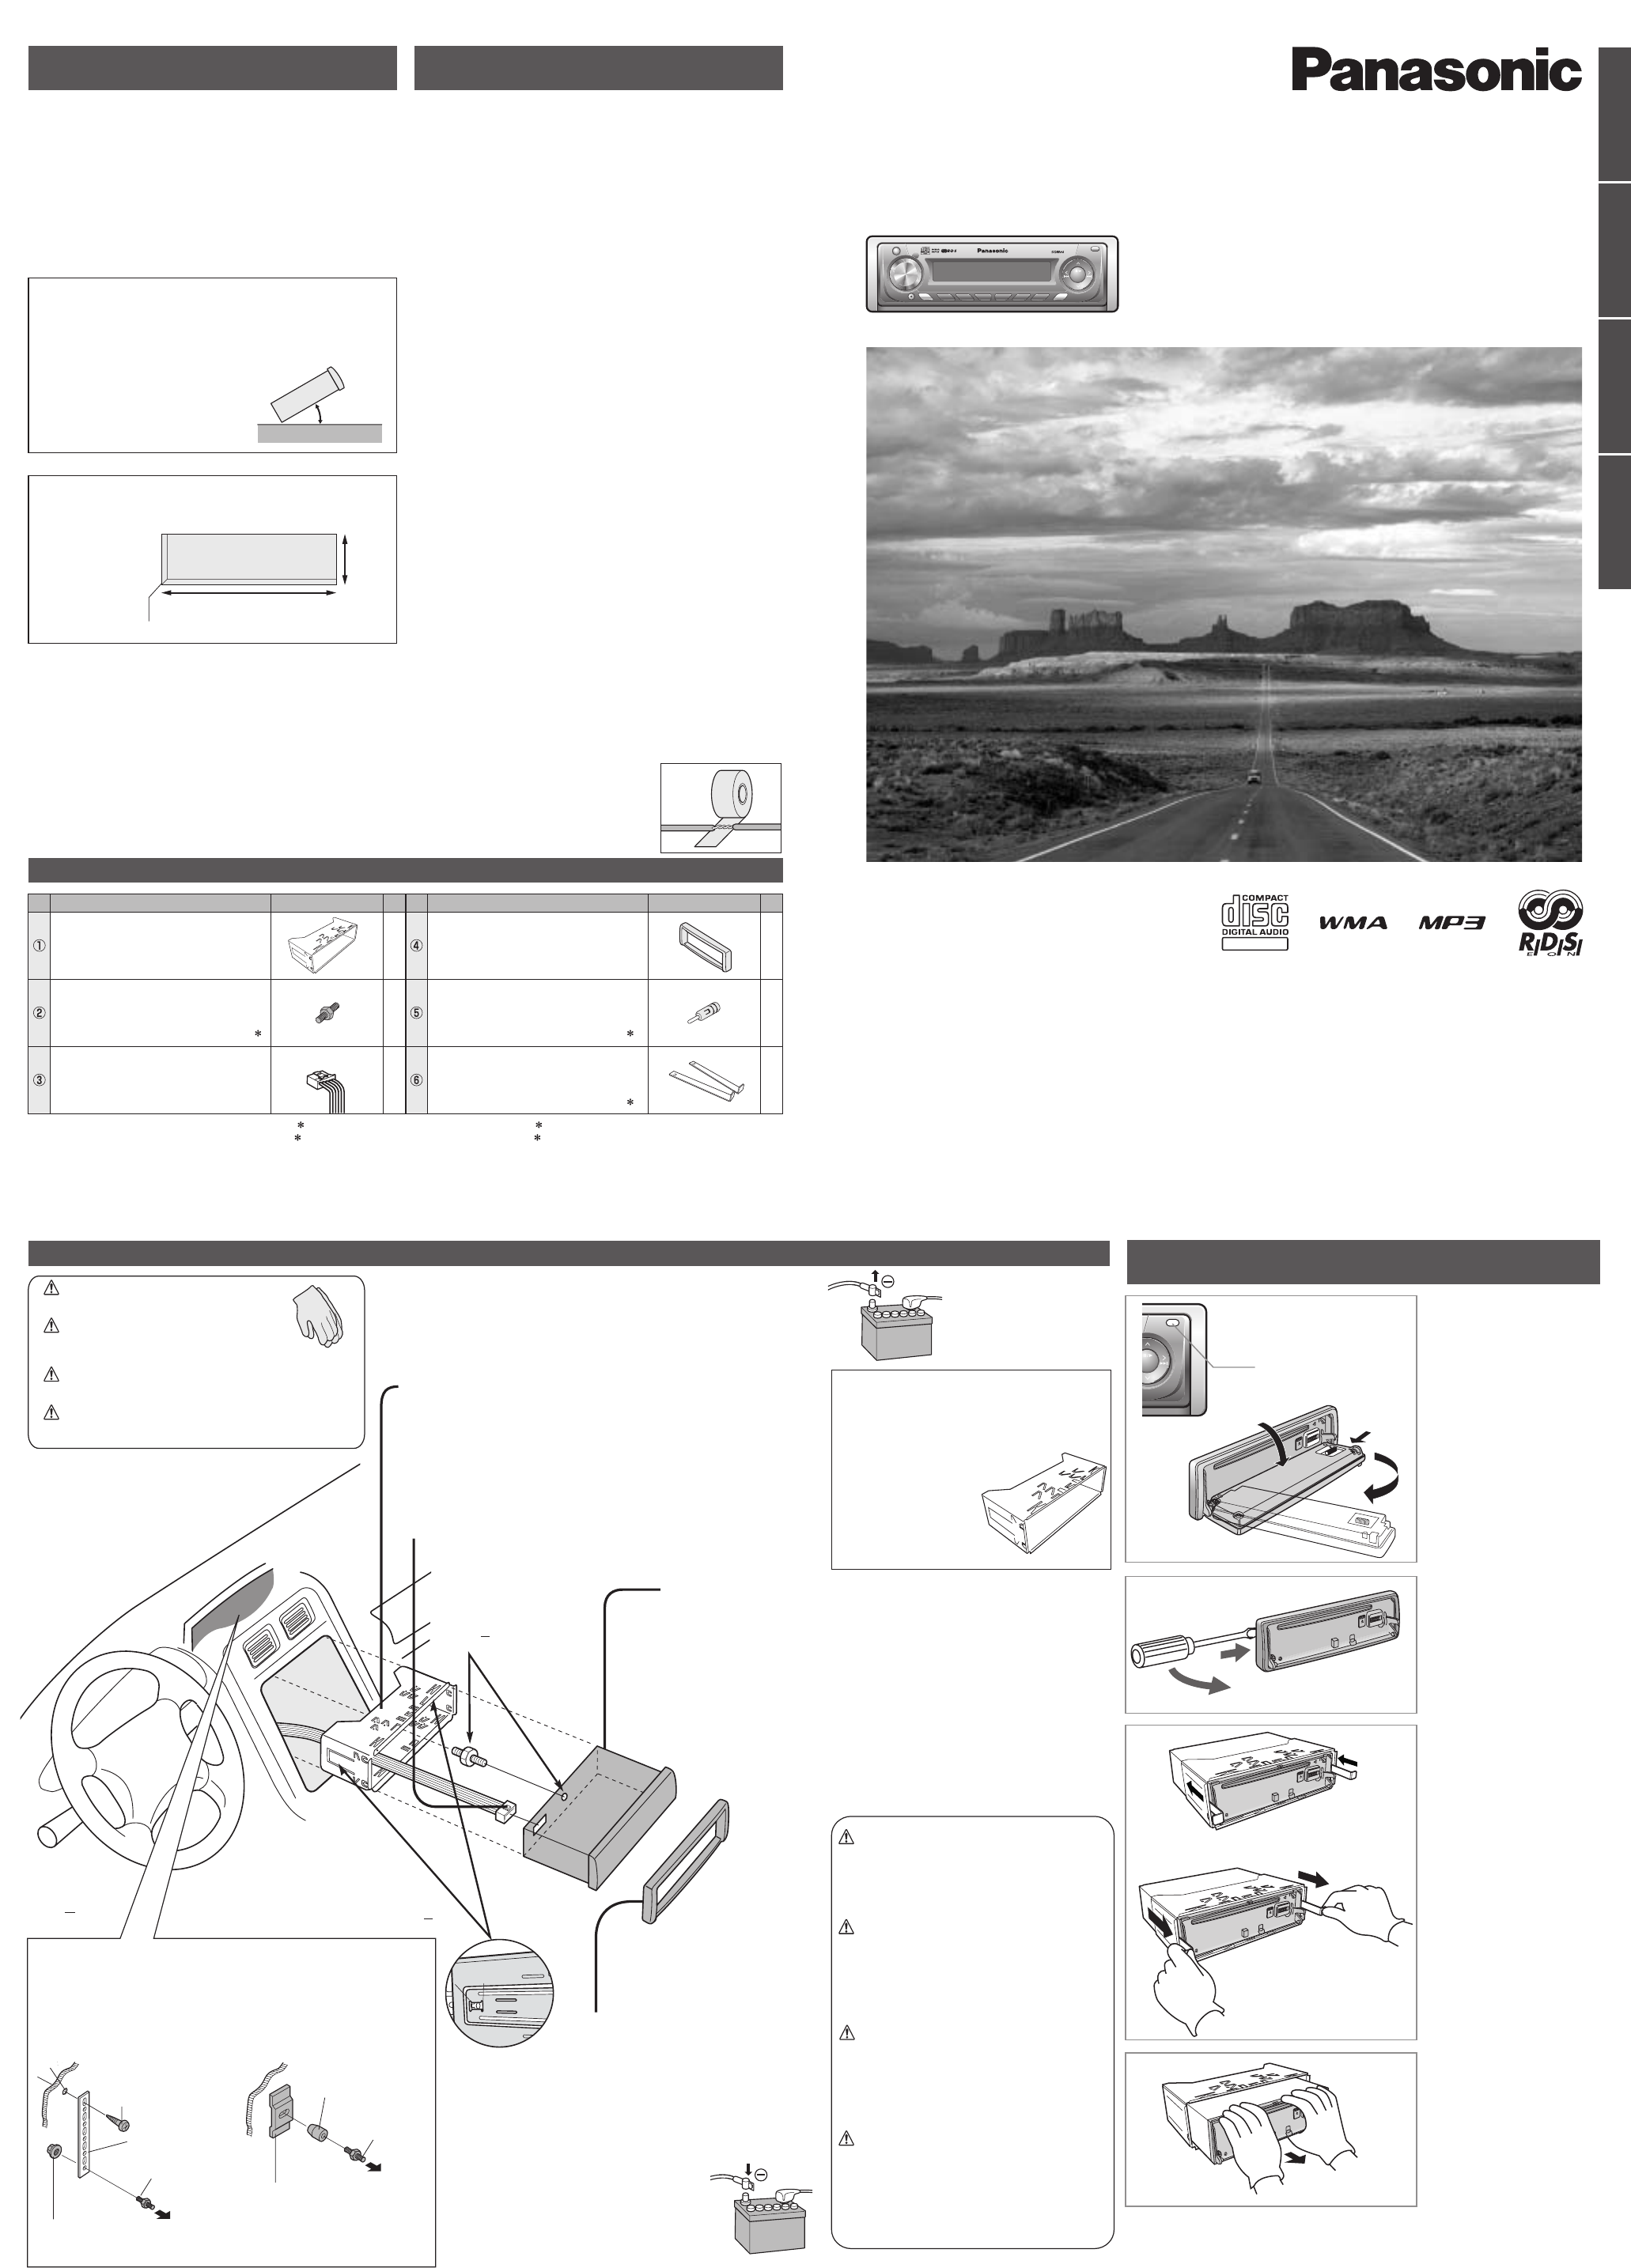 Handleiding Panasonic cq-c3301 (pagina 41 van 42) (Nederlands)